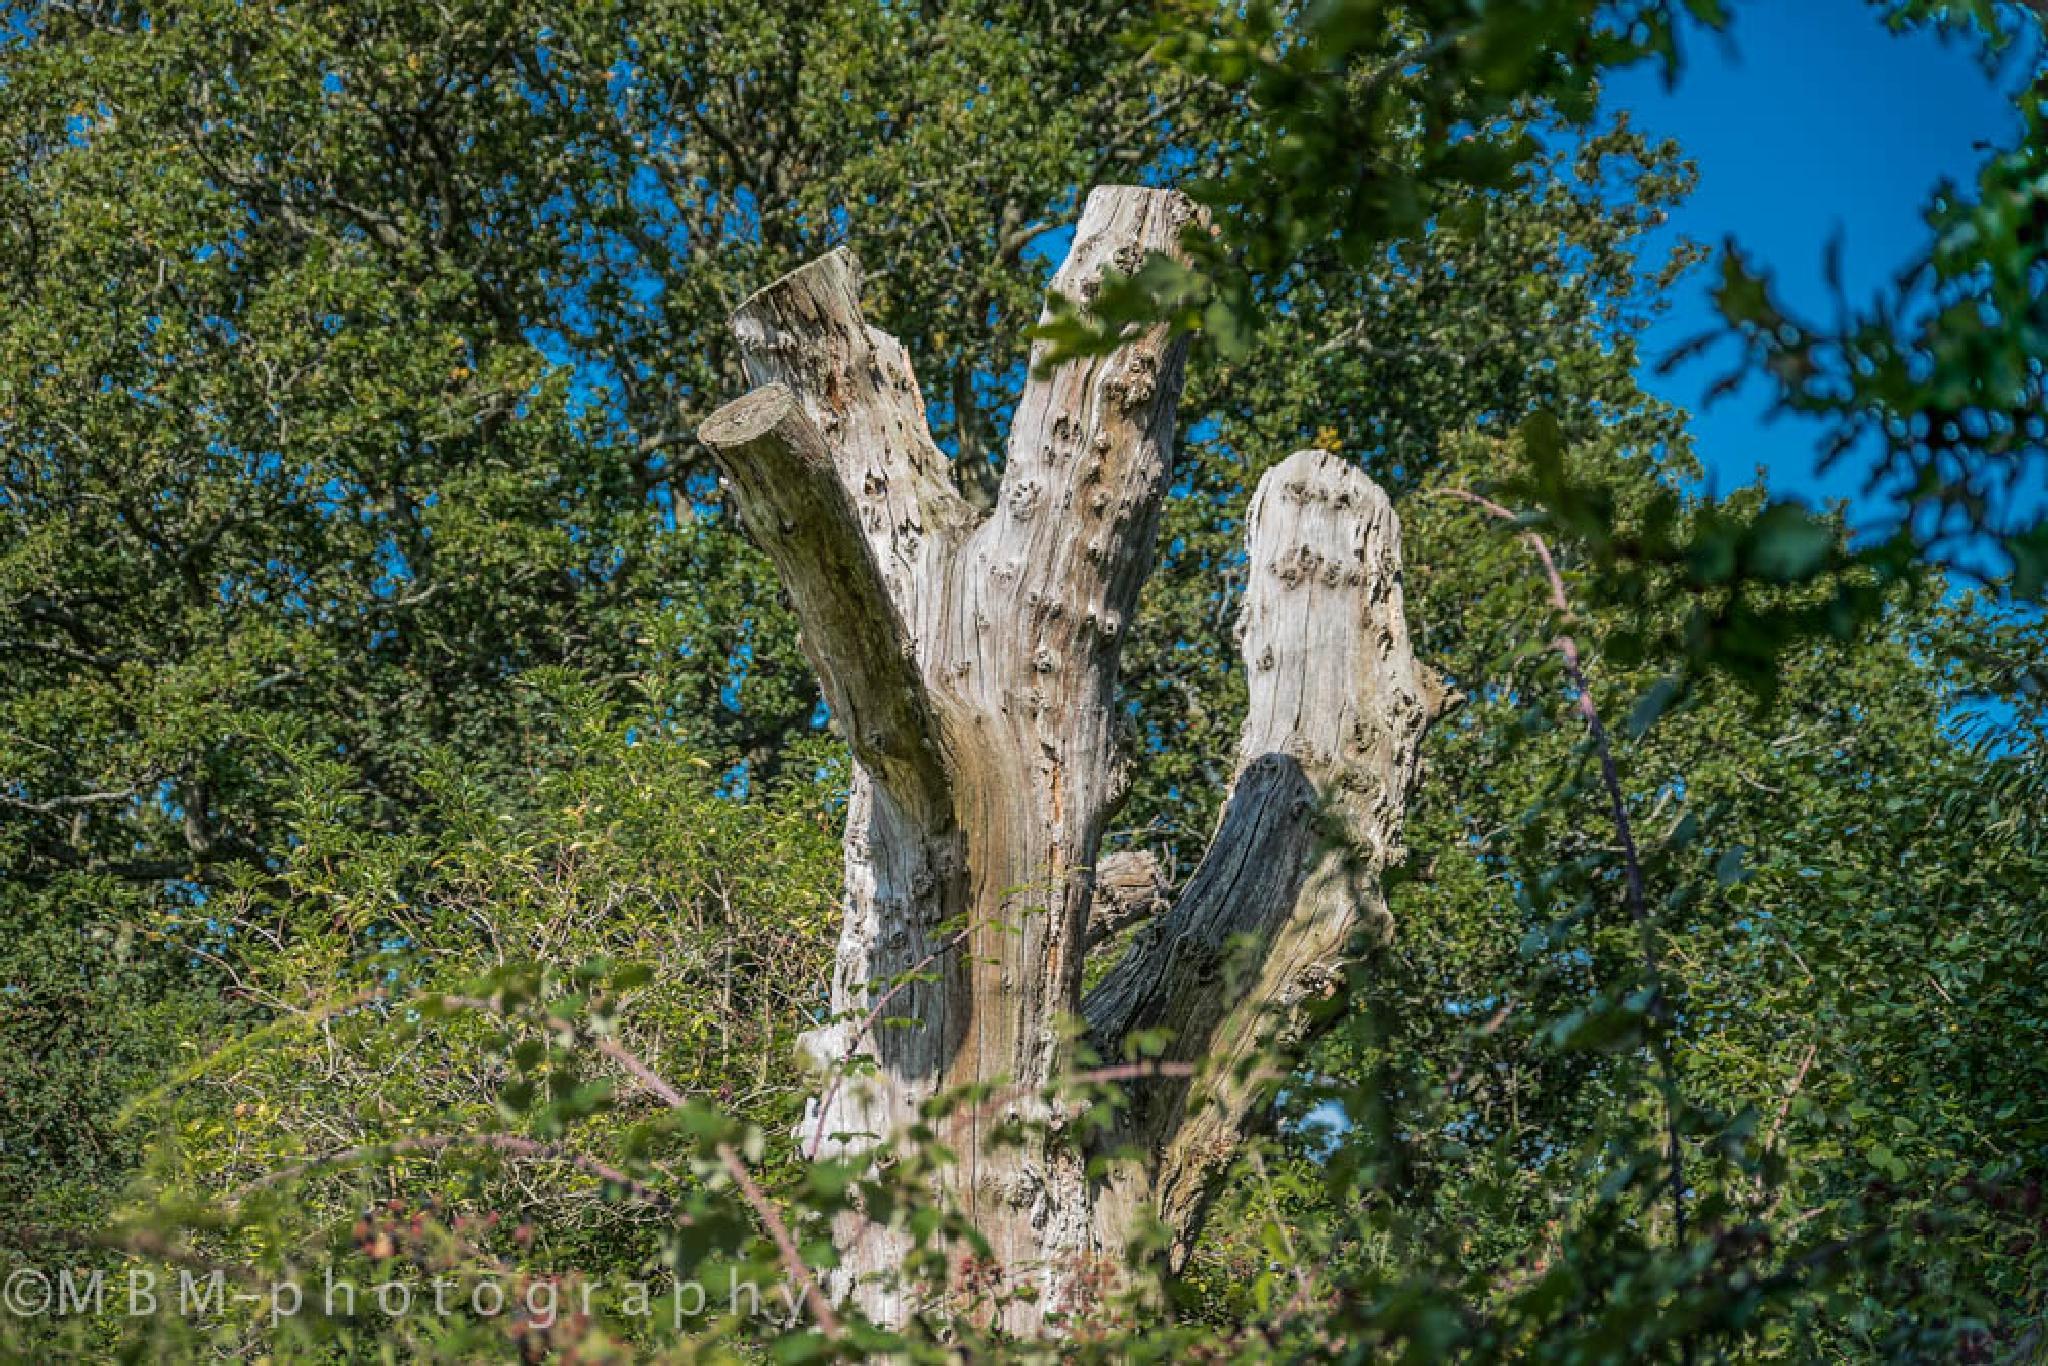 Pulborough Brooks Nature Reserve (RSPB) by Michel B